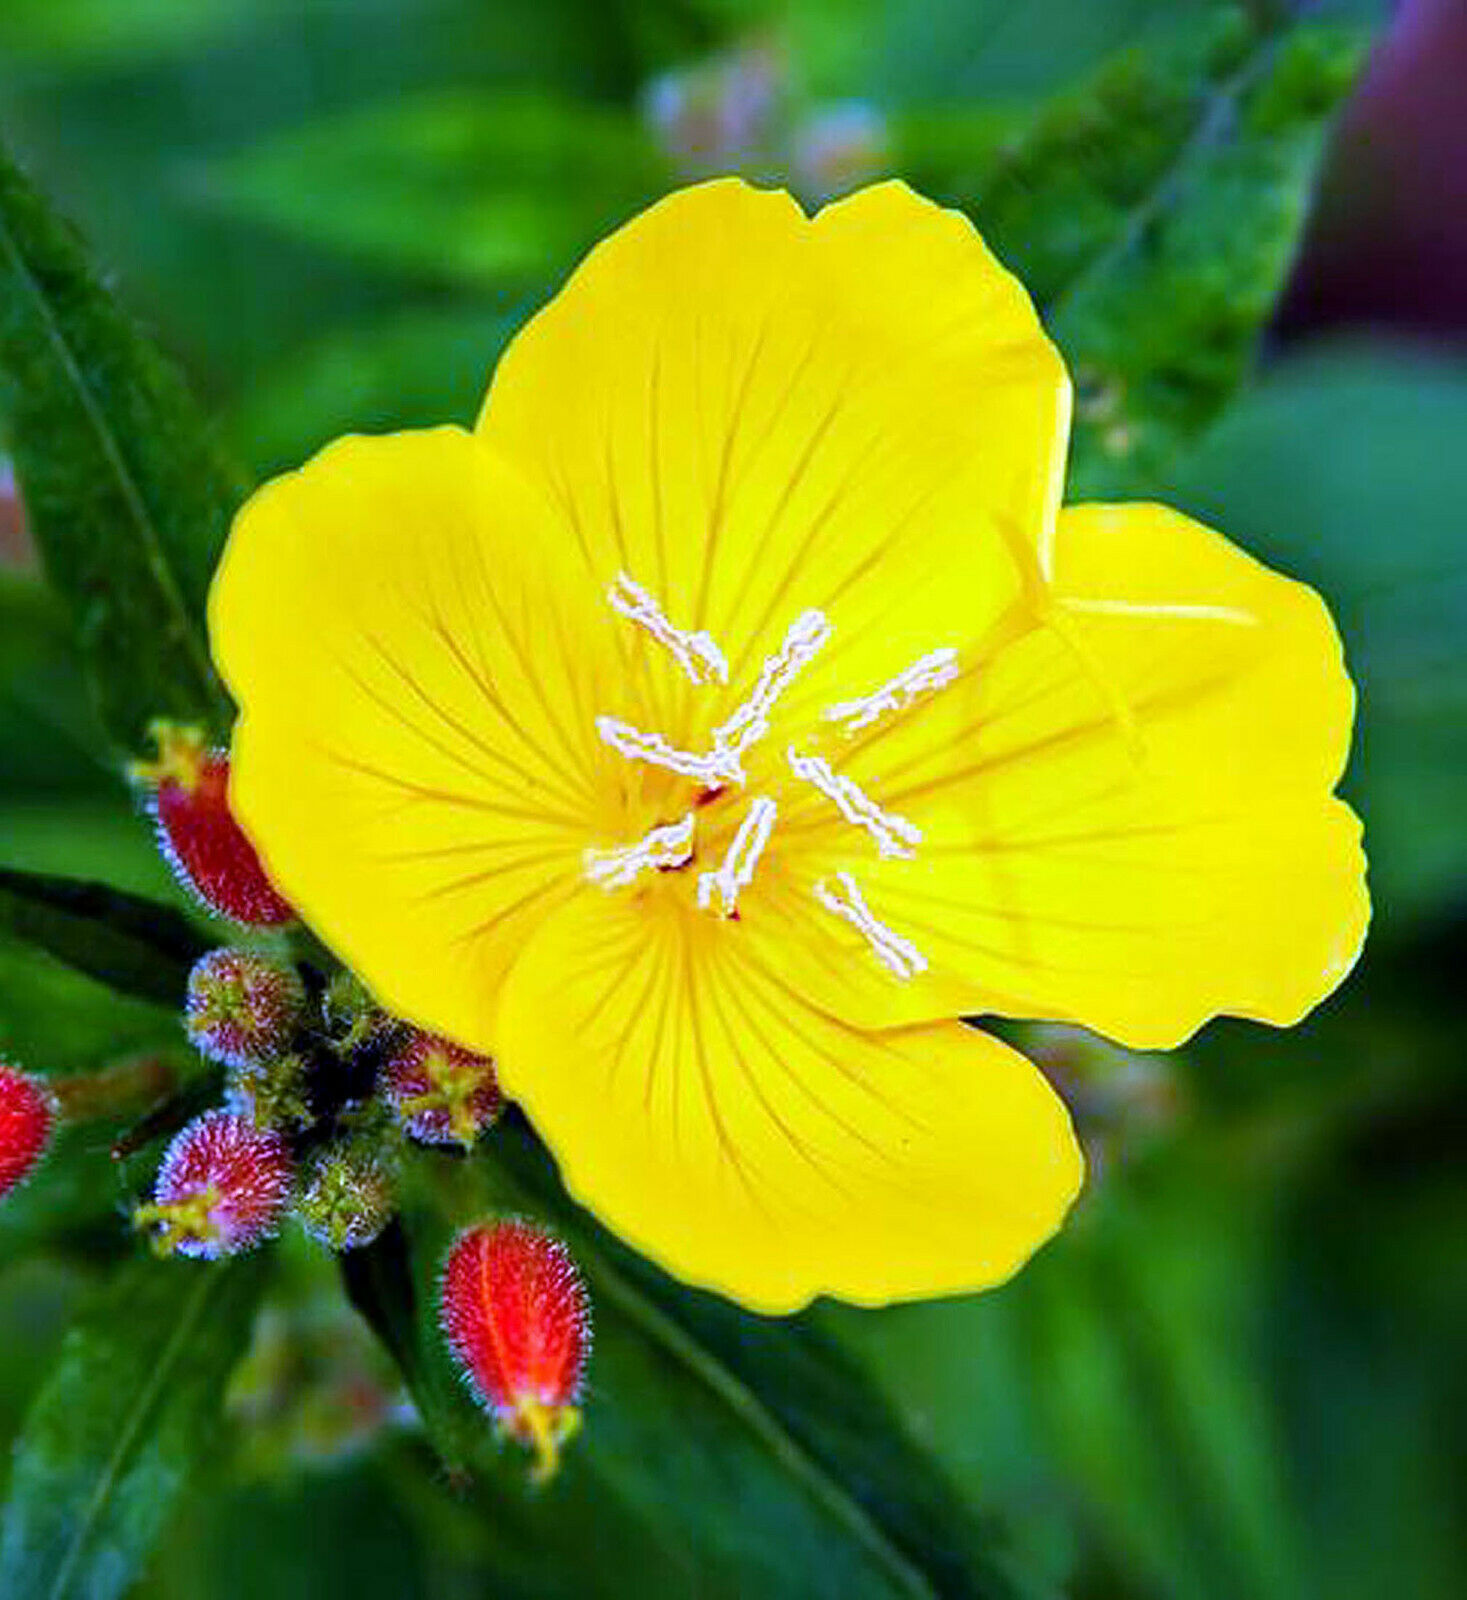 Evening Primrose Yellow - Oenothera - 400 Seeds - 2021